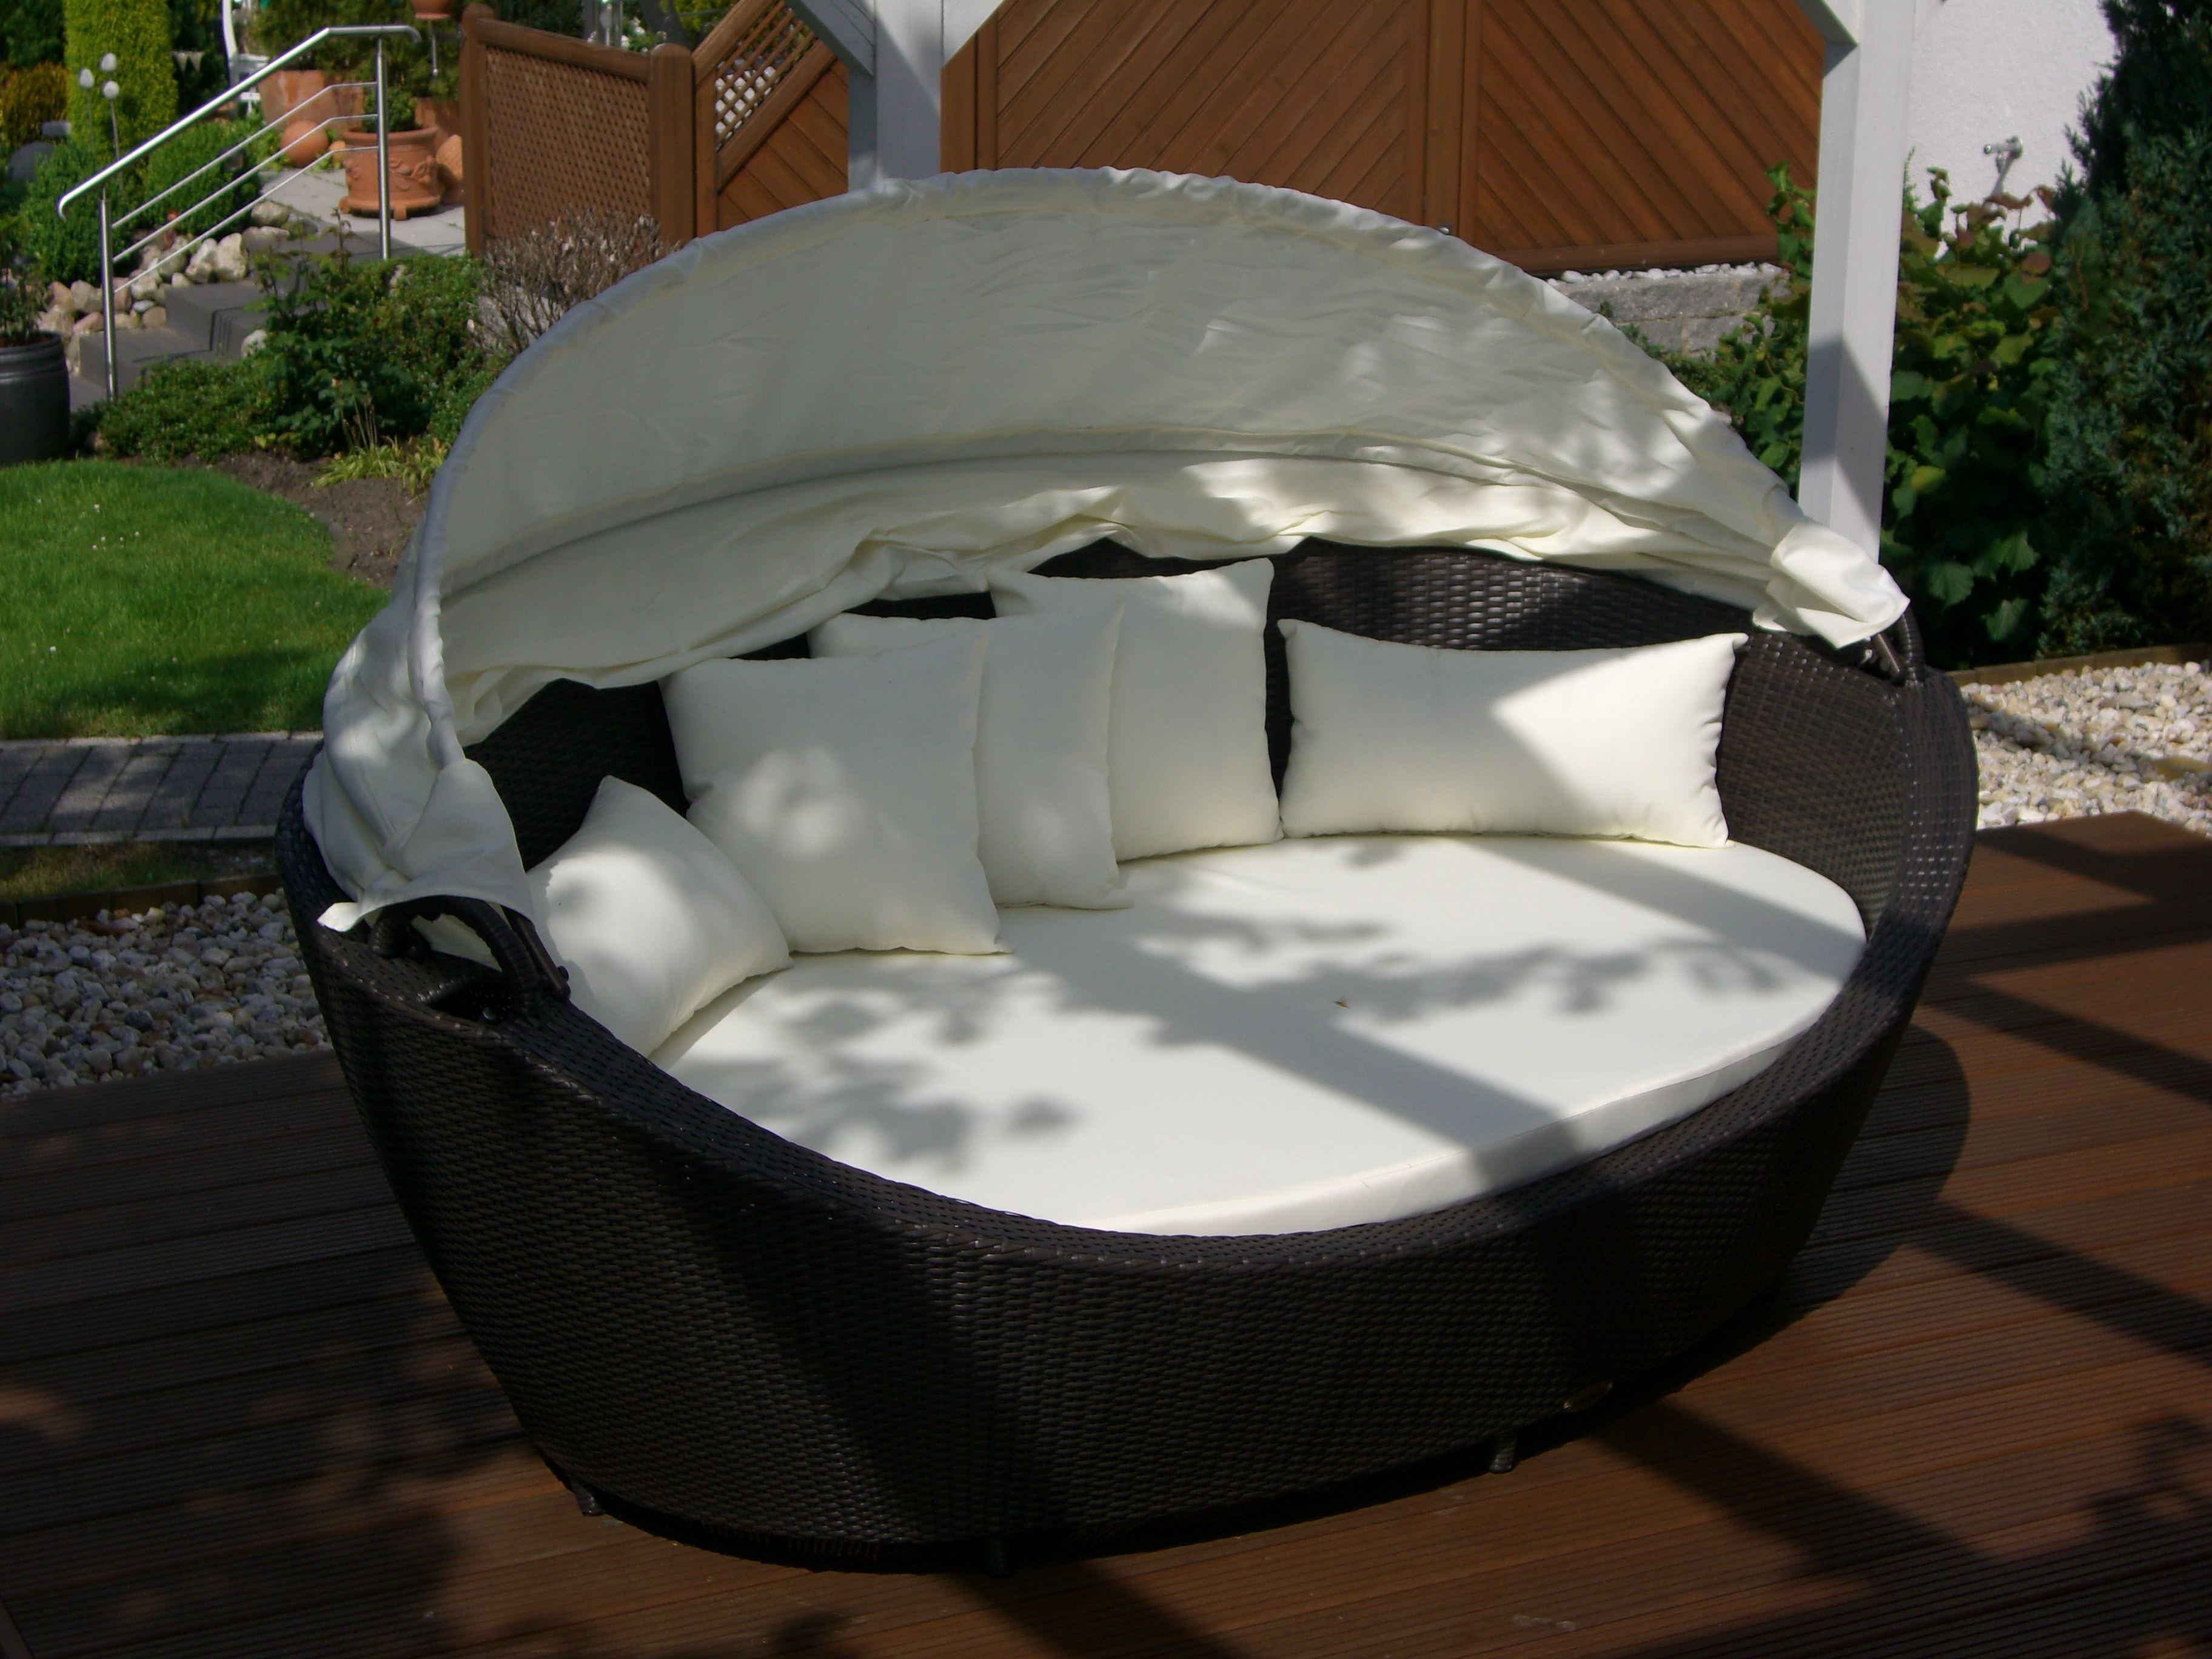 liegemuschel barcelona 1 st ck accentus gmbh gartenliegen garten rasen und balkon garten. Black Bedroom Furniture Sets. Home Design Ideas